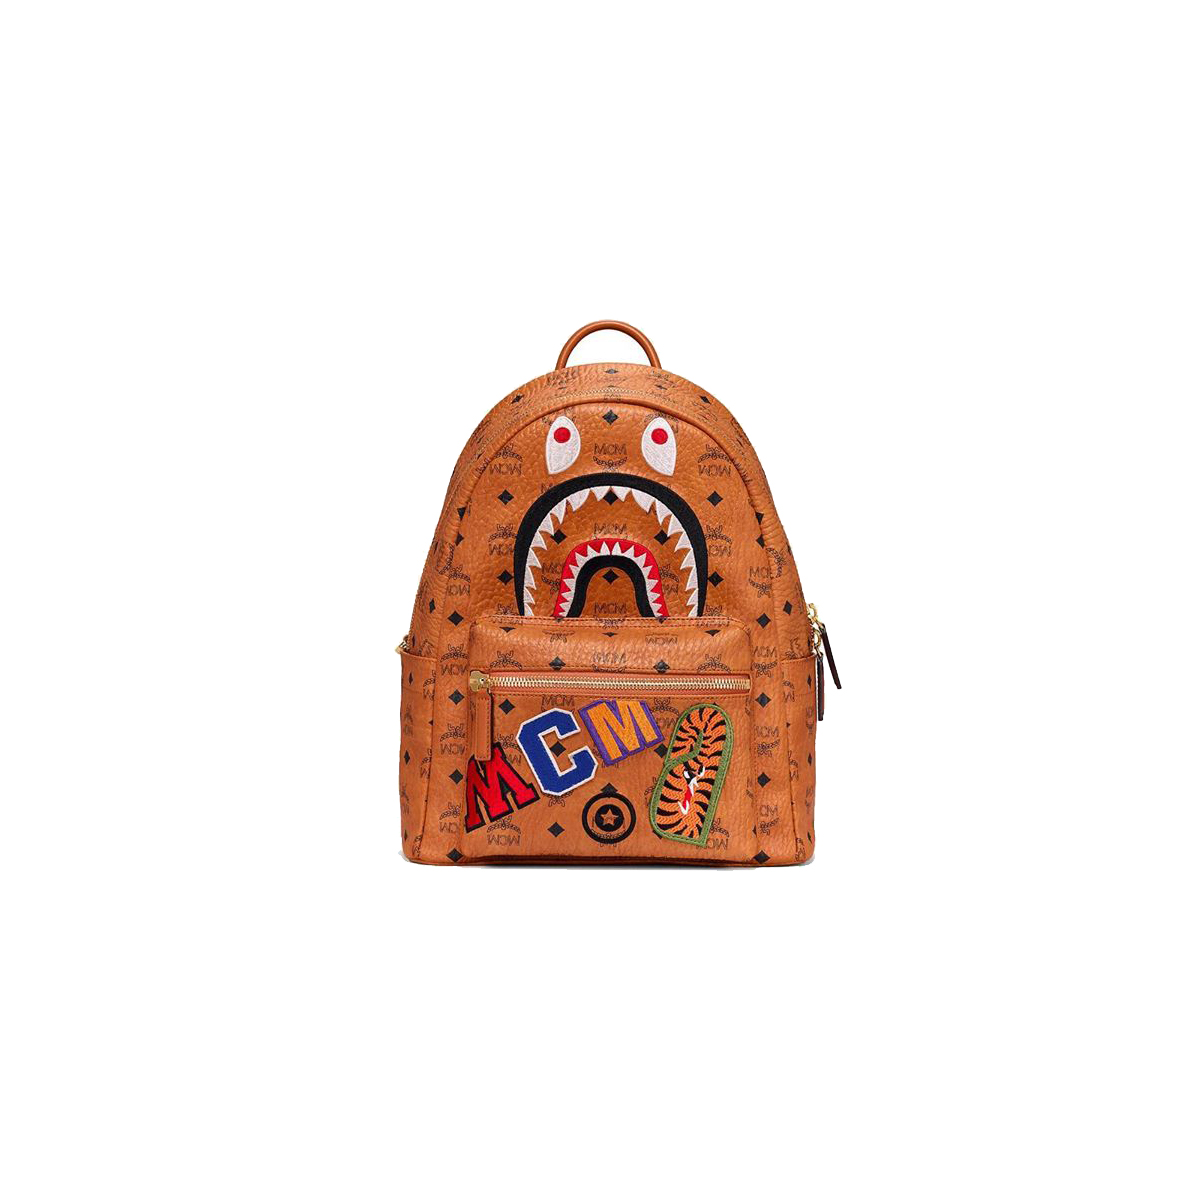 Brands-Other x MCM Monogram Leather BAPE Backpack Cognac (2019)